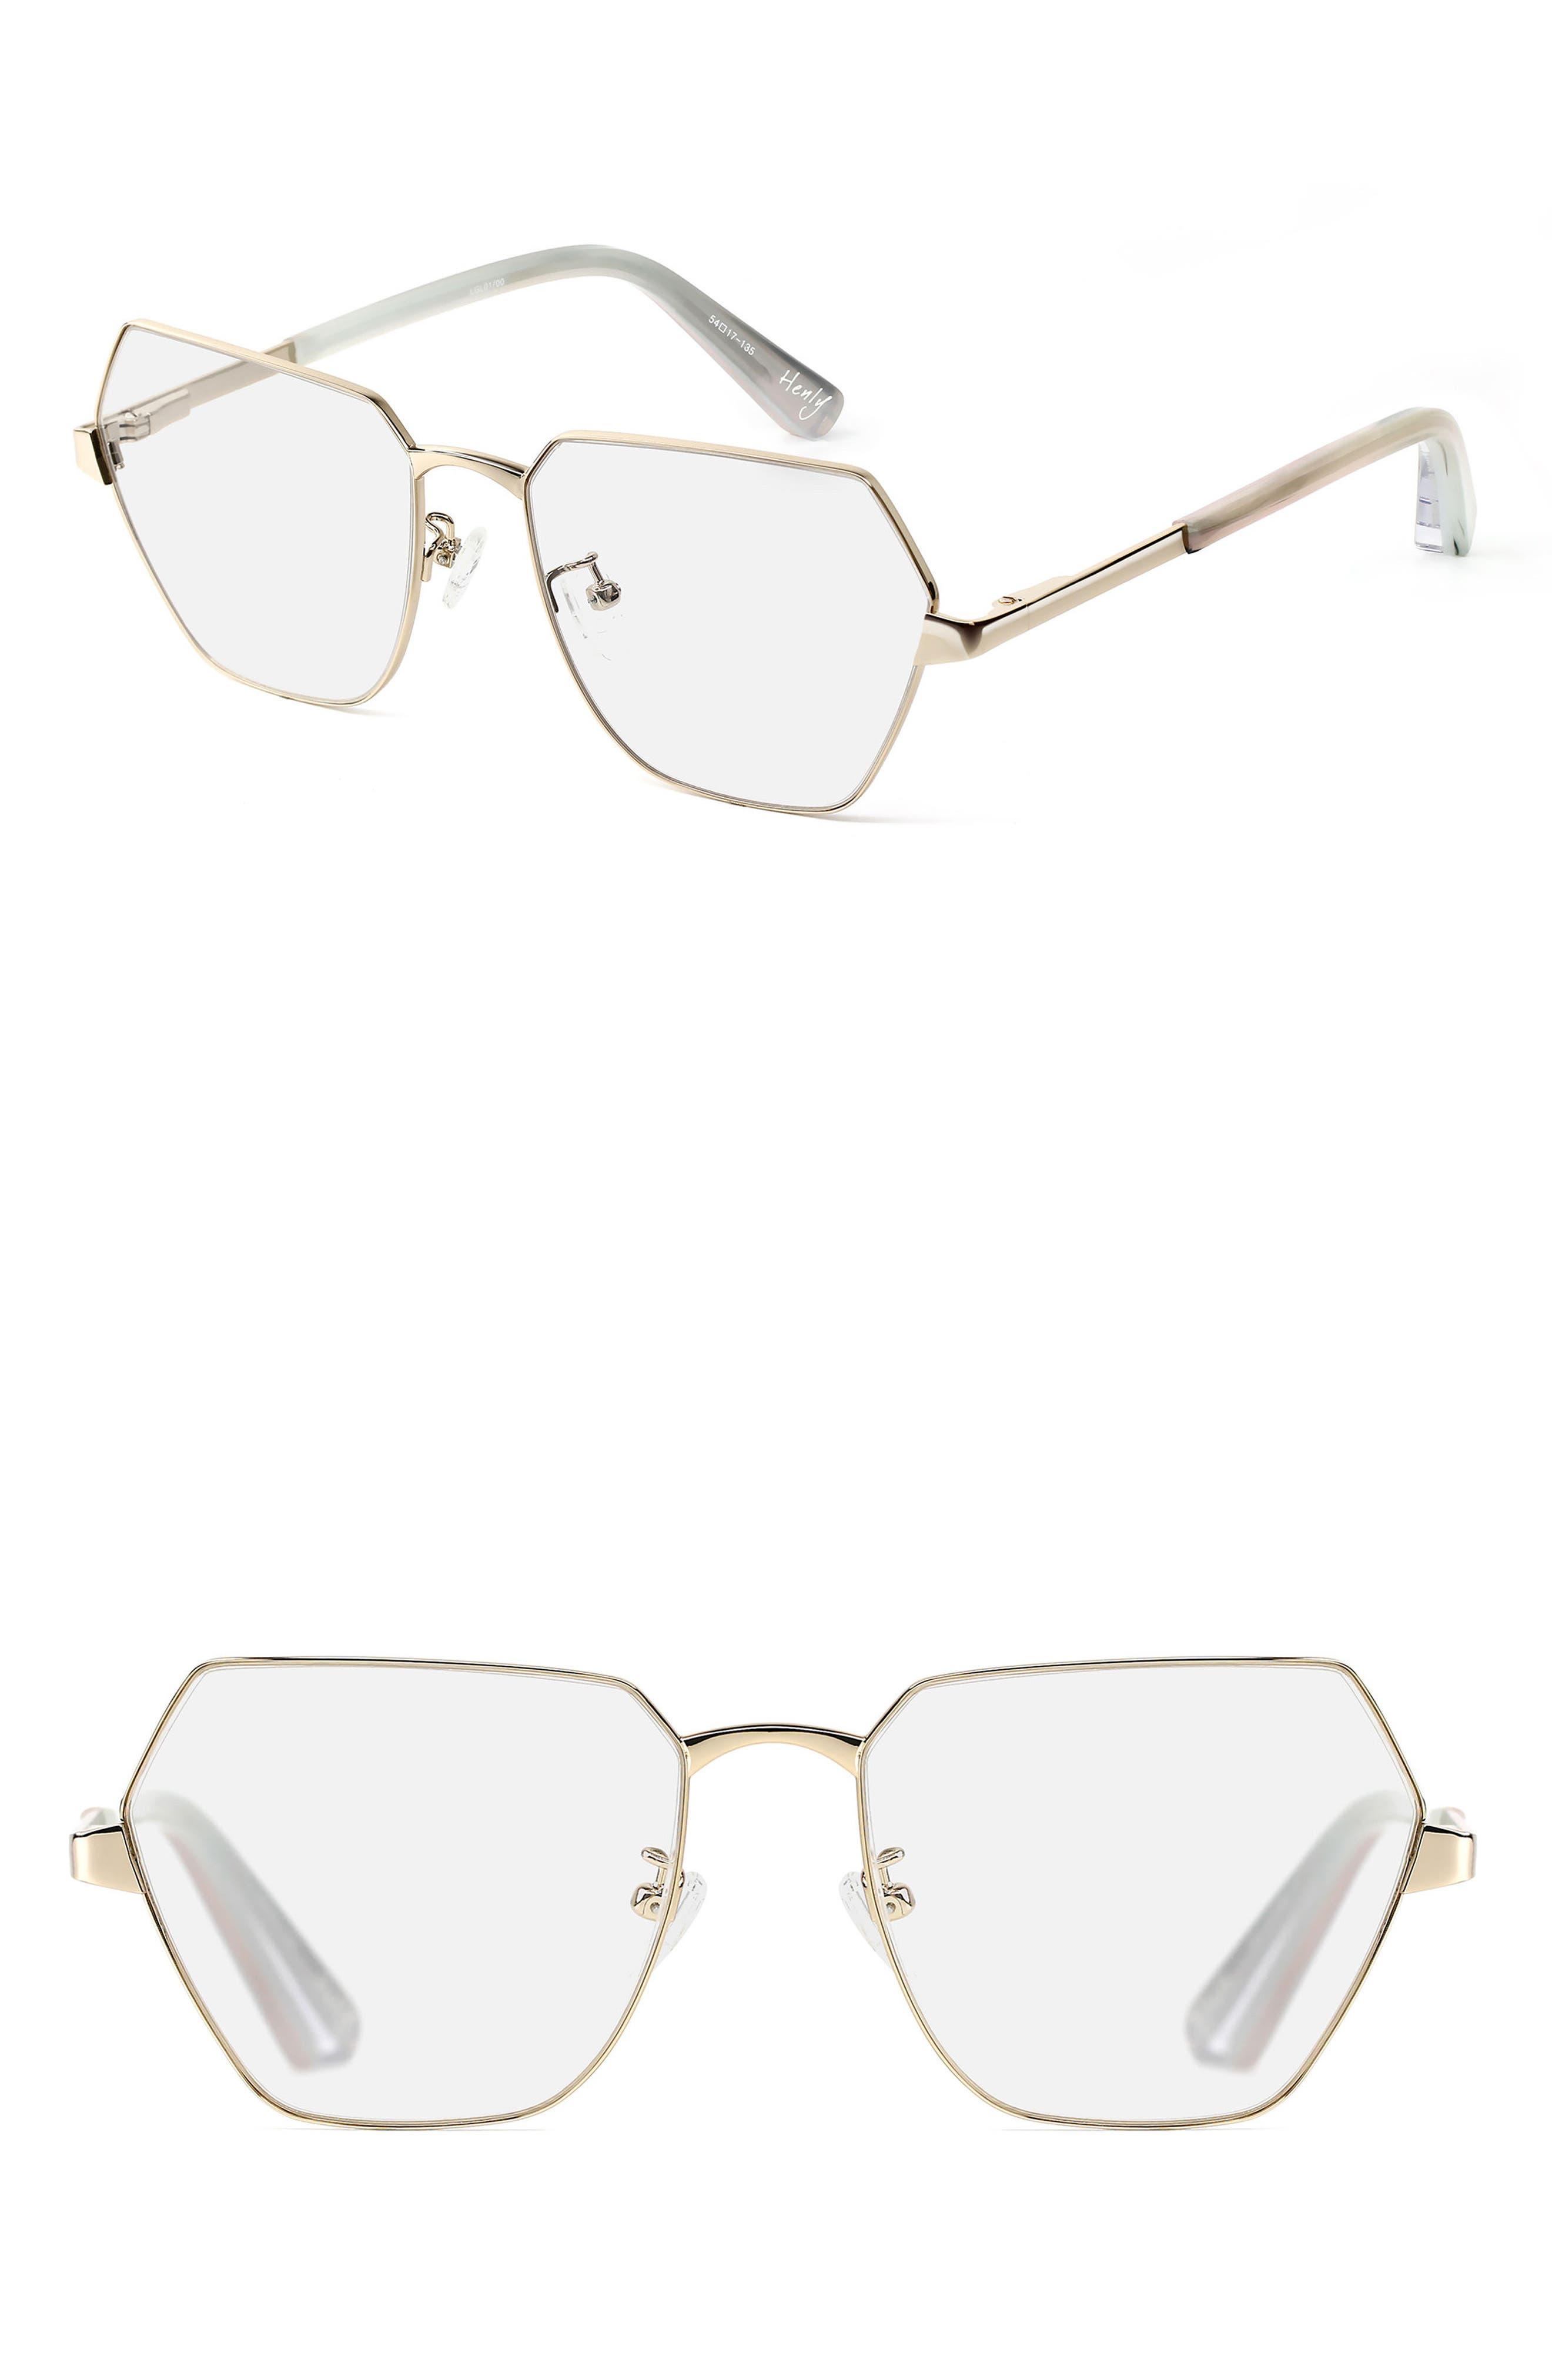 Henly 54mm Optical Glasses,                             Main thumbnail 1, color,                             Light Gold